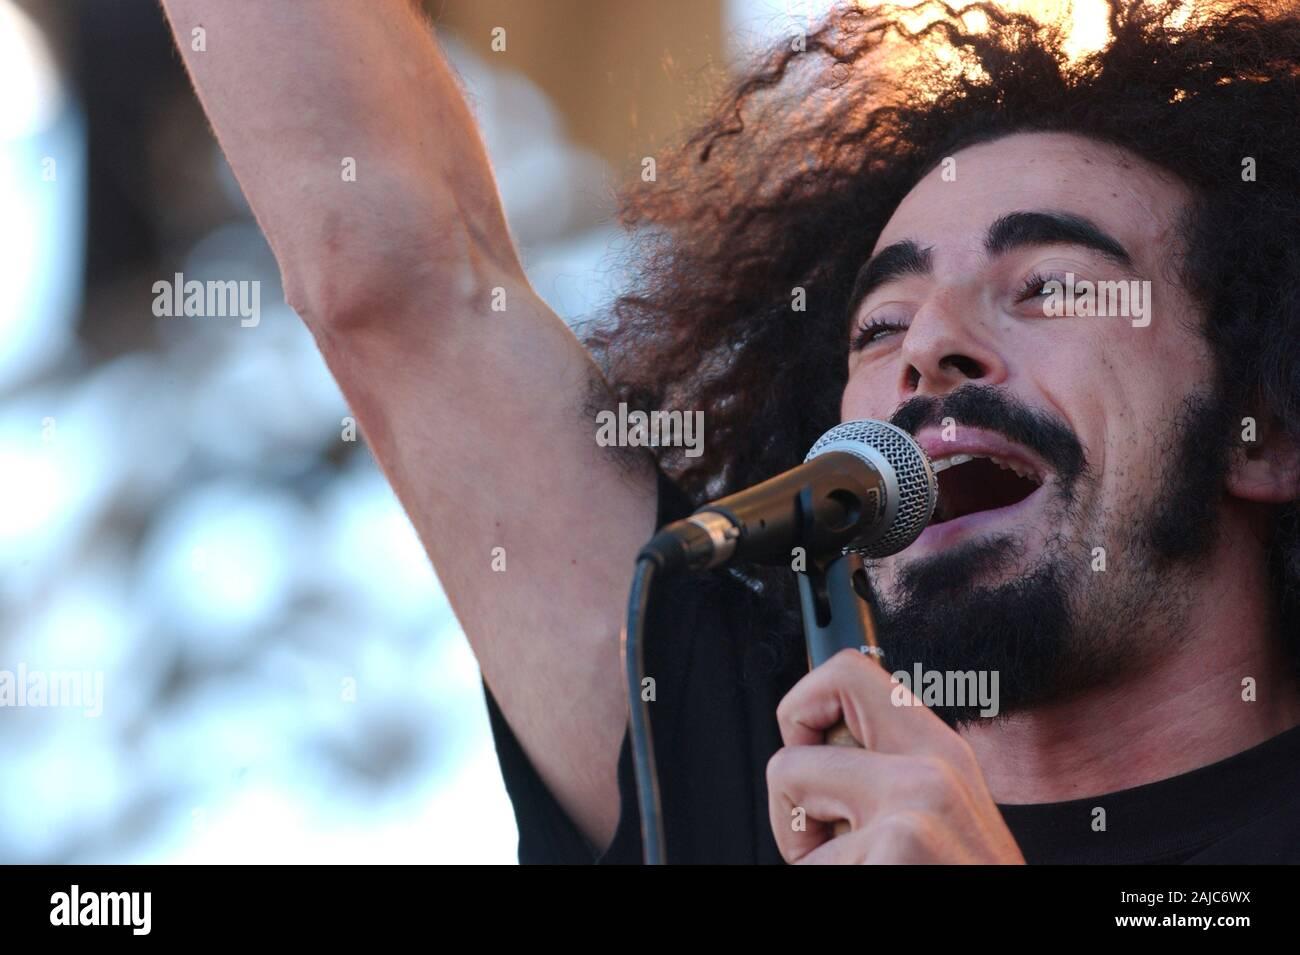 "Italy Imola , 18-19-20 June 2004 ""Heineken Jammin Festival 2004"" Autodromo di Imola: Caparezza during the concert Stock Photo"